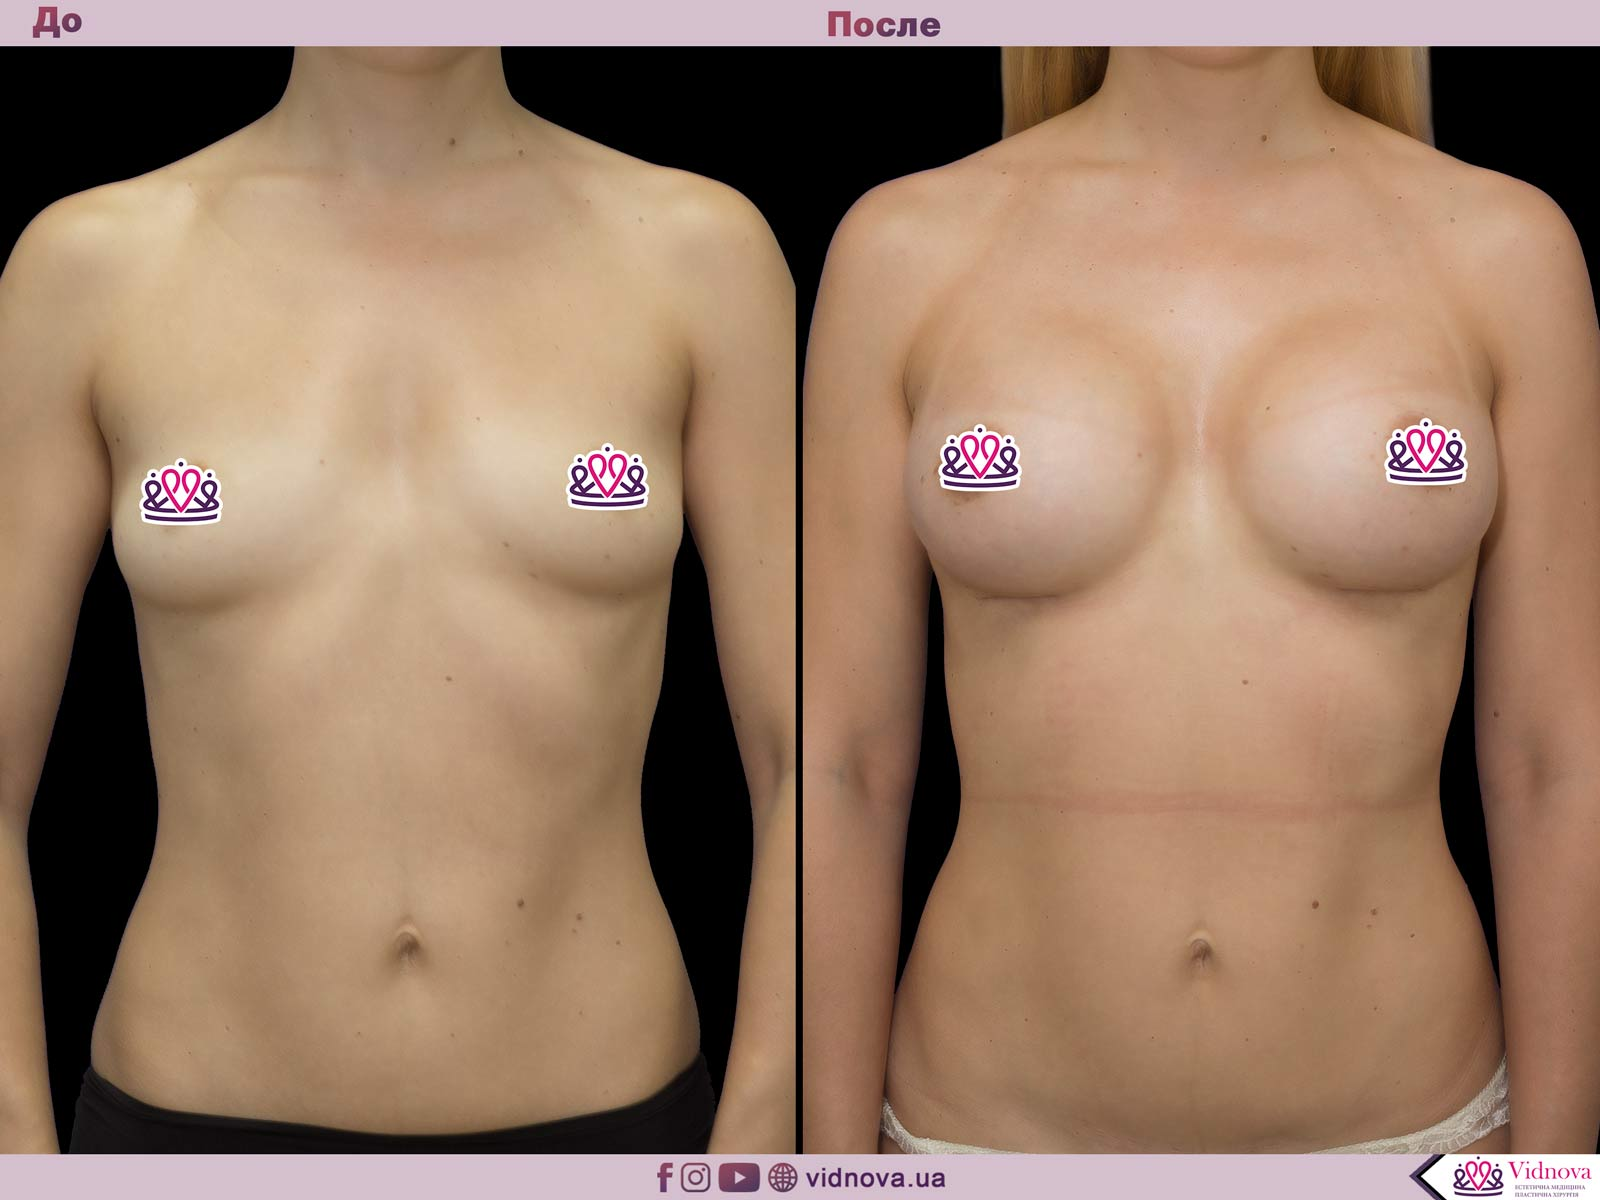 Увеличение груди: Фото ДО и ПОСЛЕ - Пример №54-1 - Клиника Vidnova